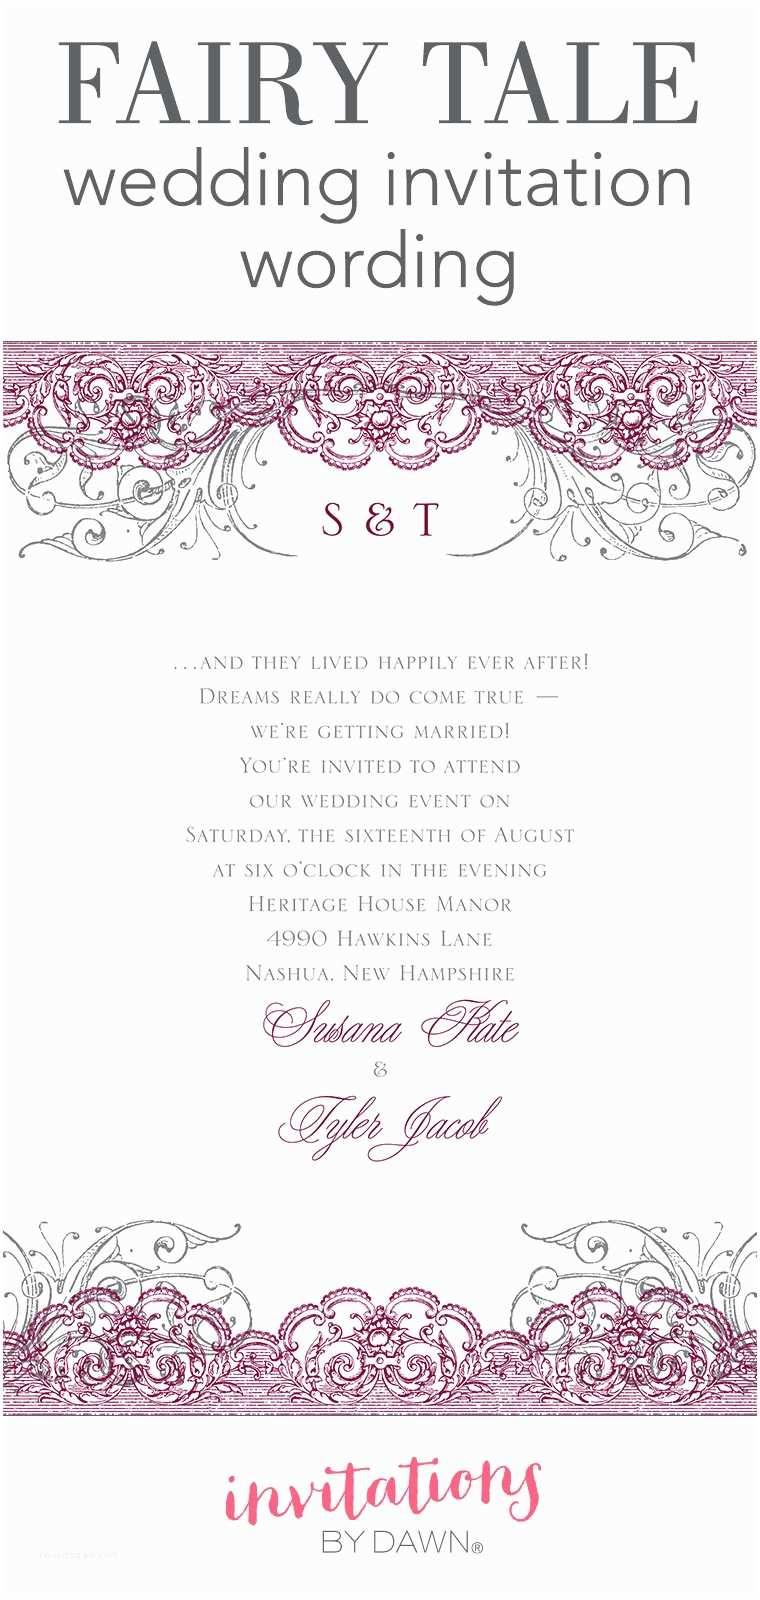 Unusual Wedding Invitation Wording Create Easy Wedding Invitation Wording Ideas